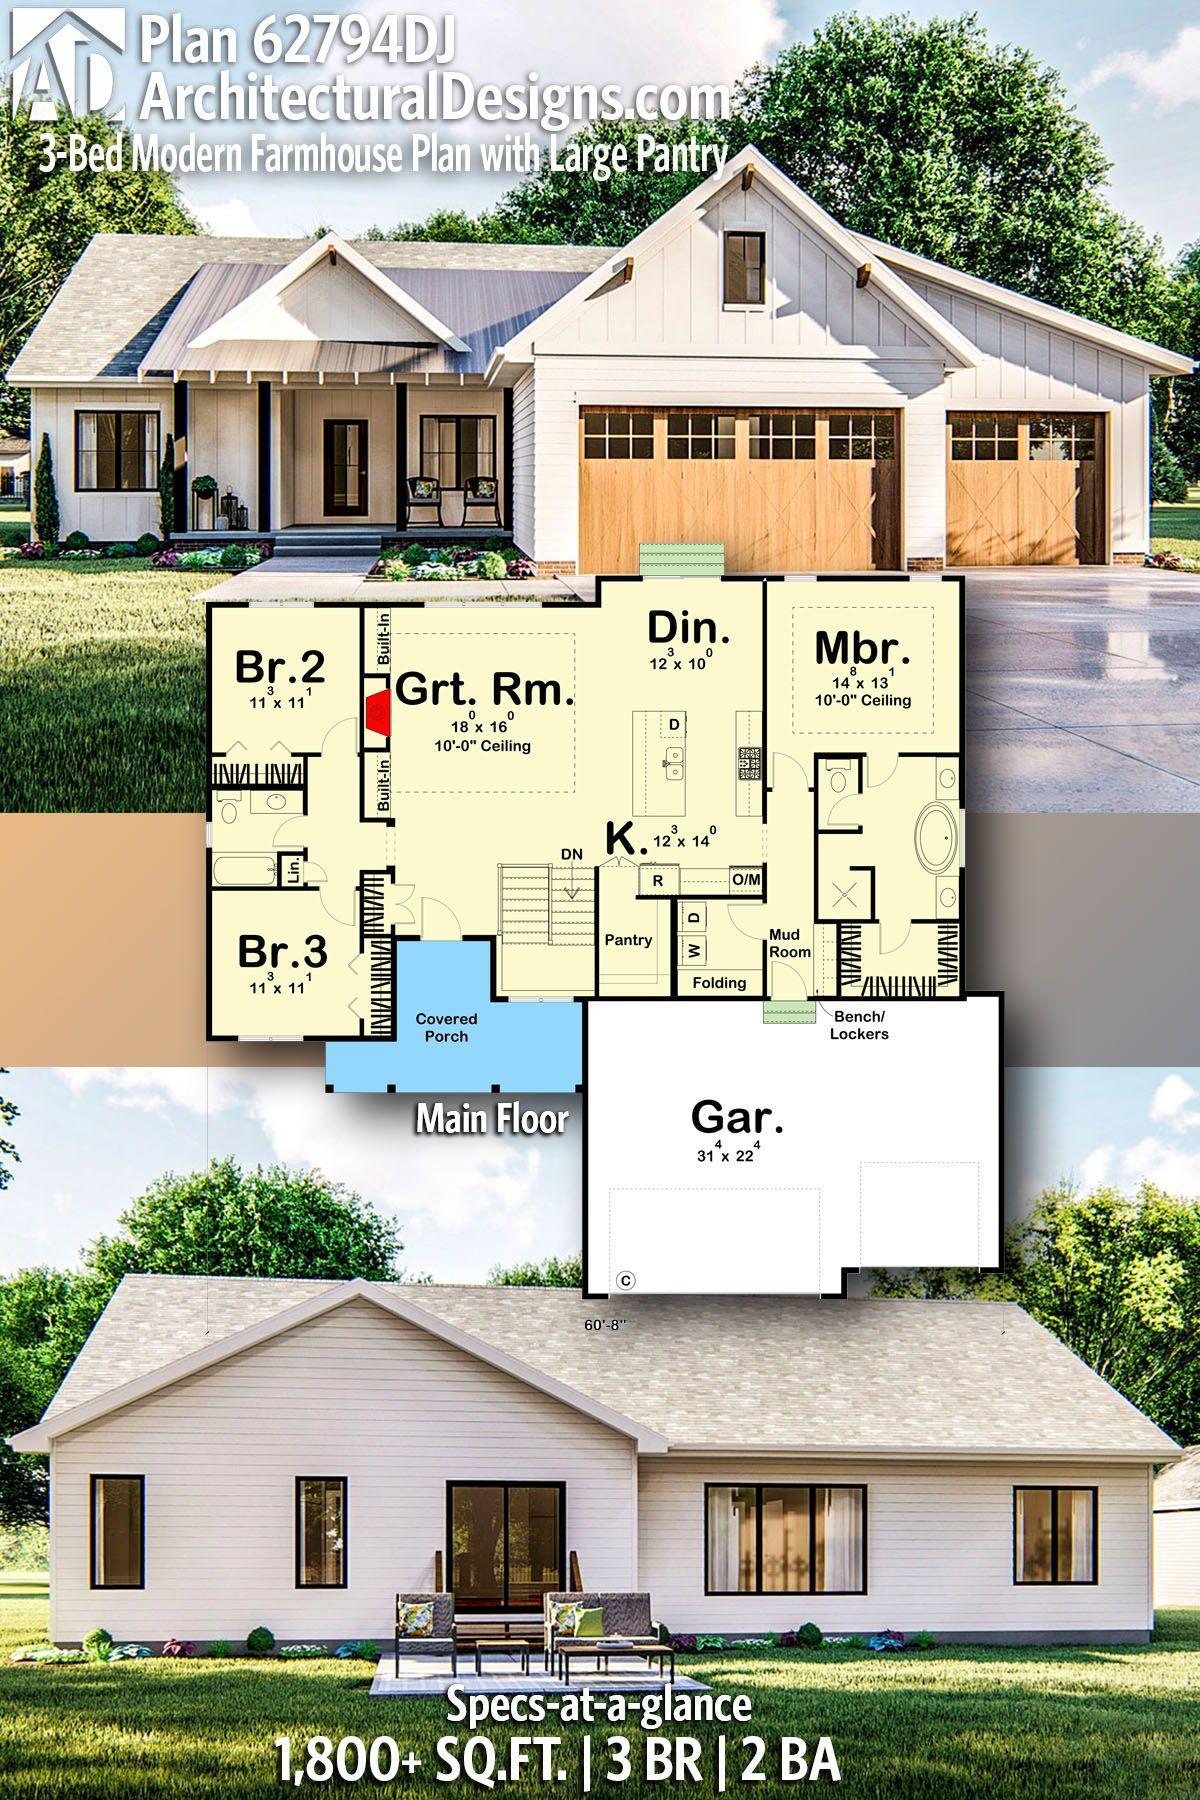 Plan 62794DJ: 3-Bed Modern Farmhouse Plan with Large Pantry #modernfarmhousestyle